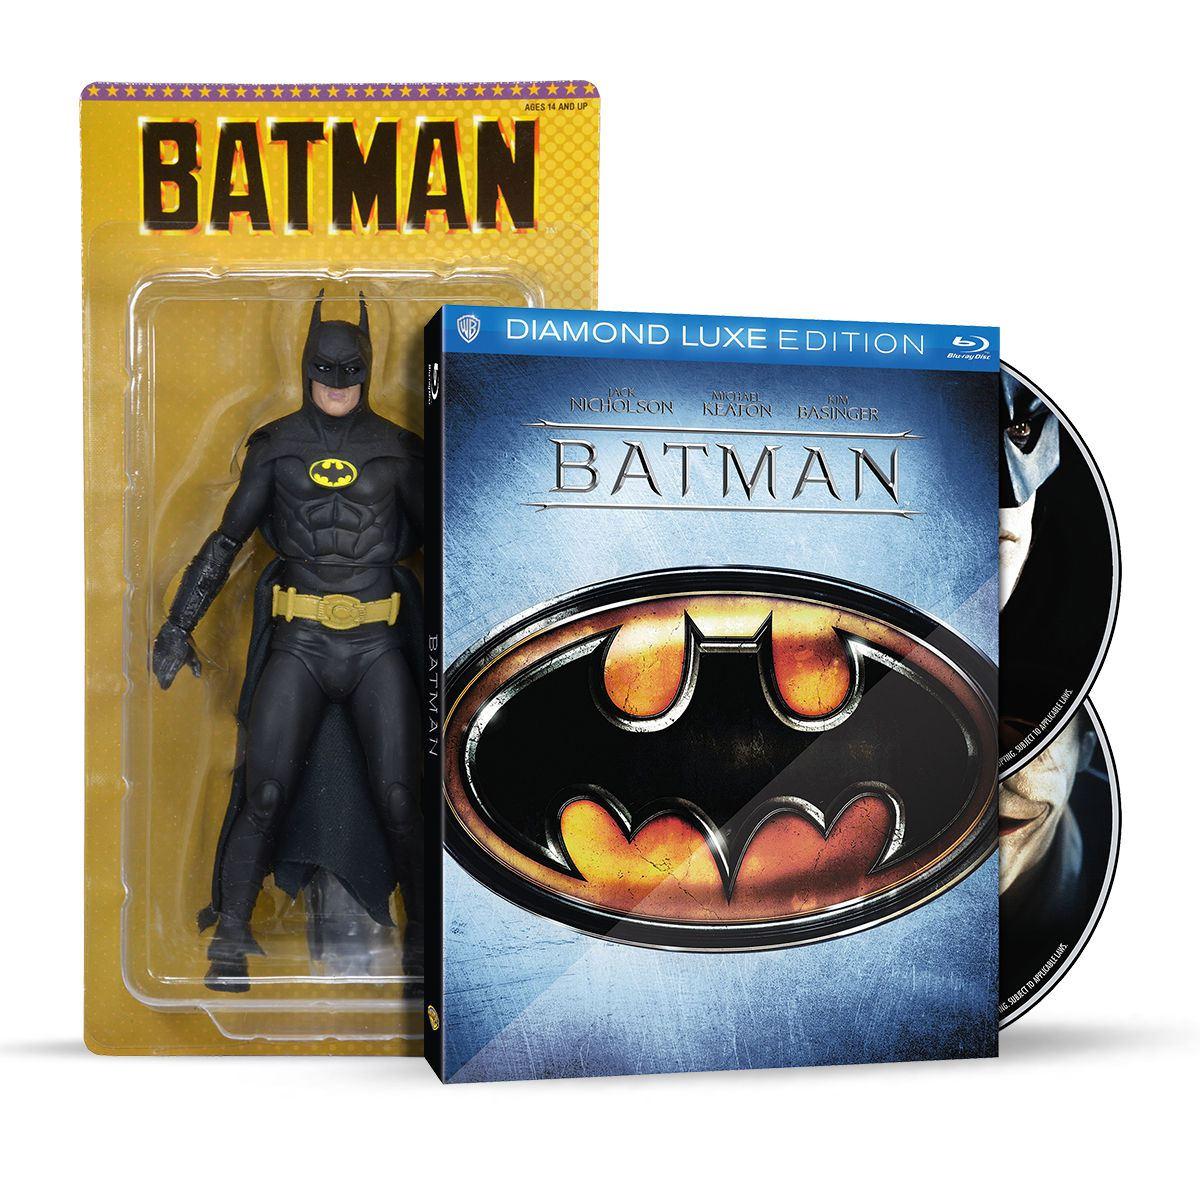 NECA-Batman-1989-Luxe-Edition-Bluray-Figure-and-Movie